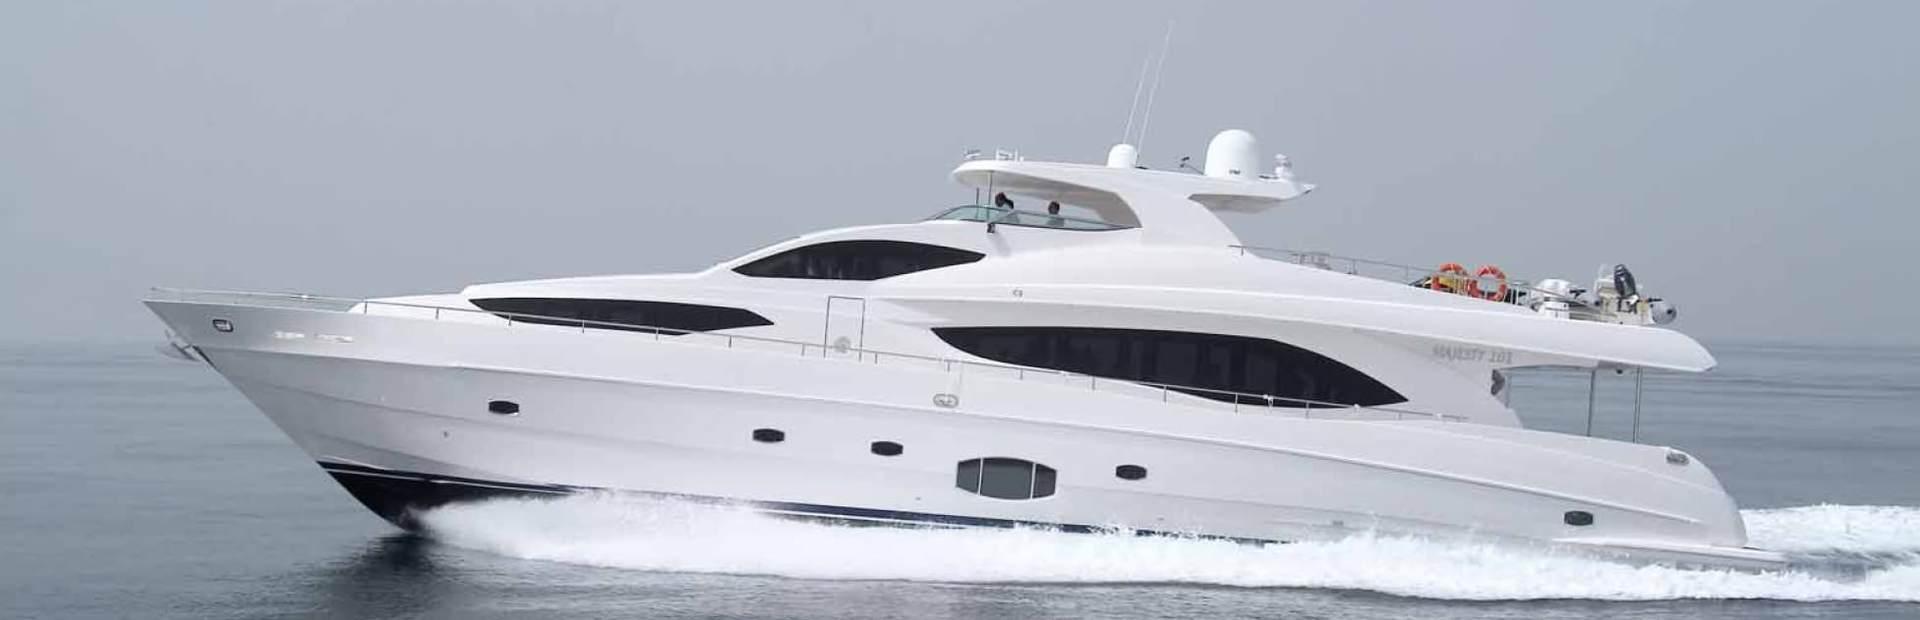 Majesty 101 Yacht Charter